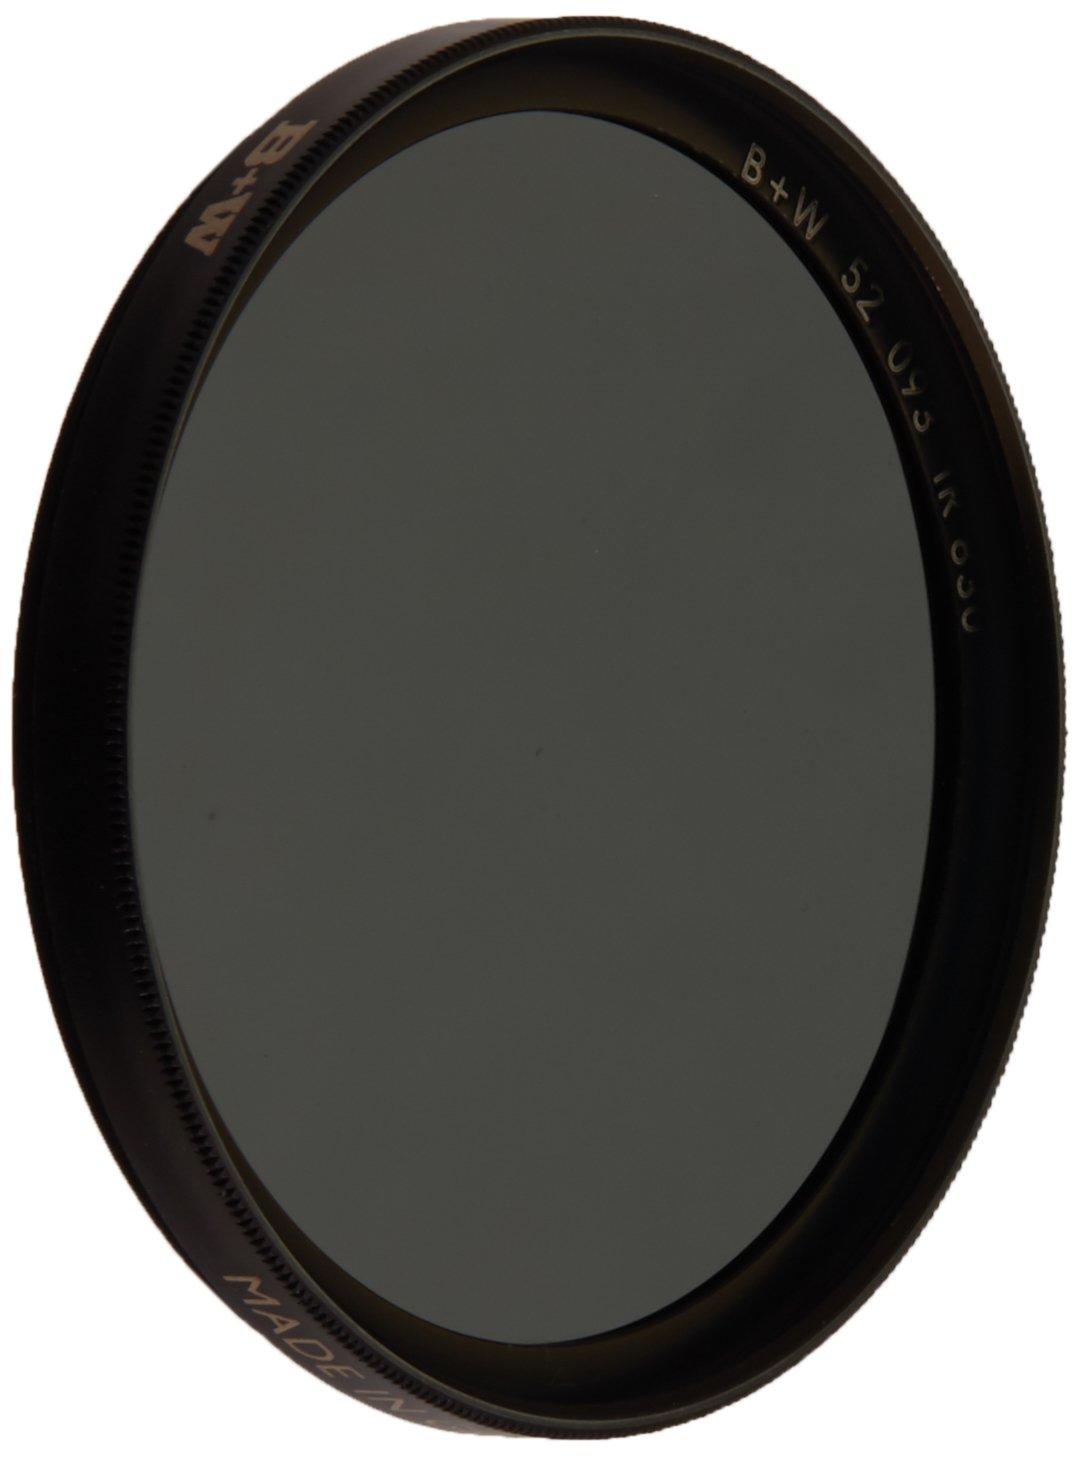 Black 093 B+W 52mm Infrared Pass Camera Lens Filter